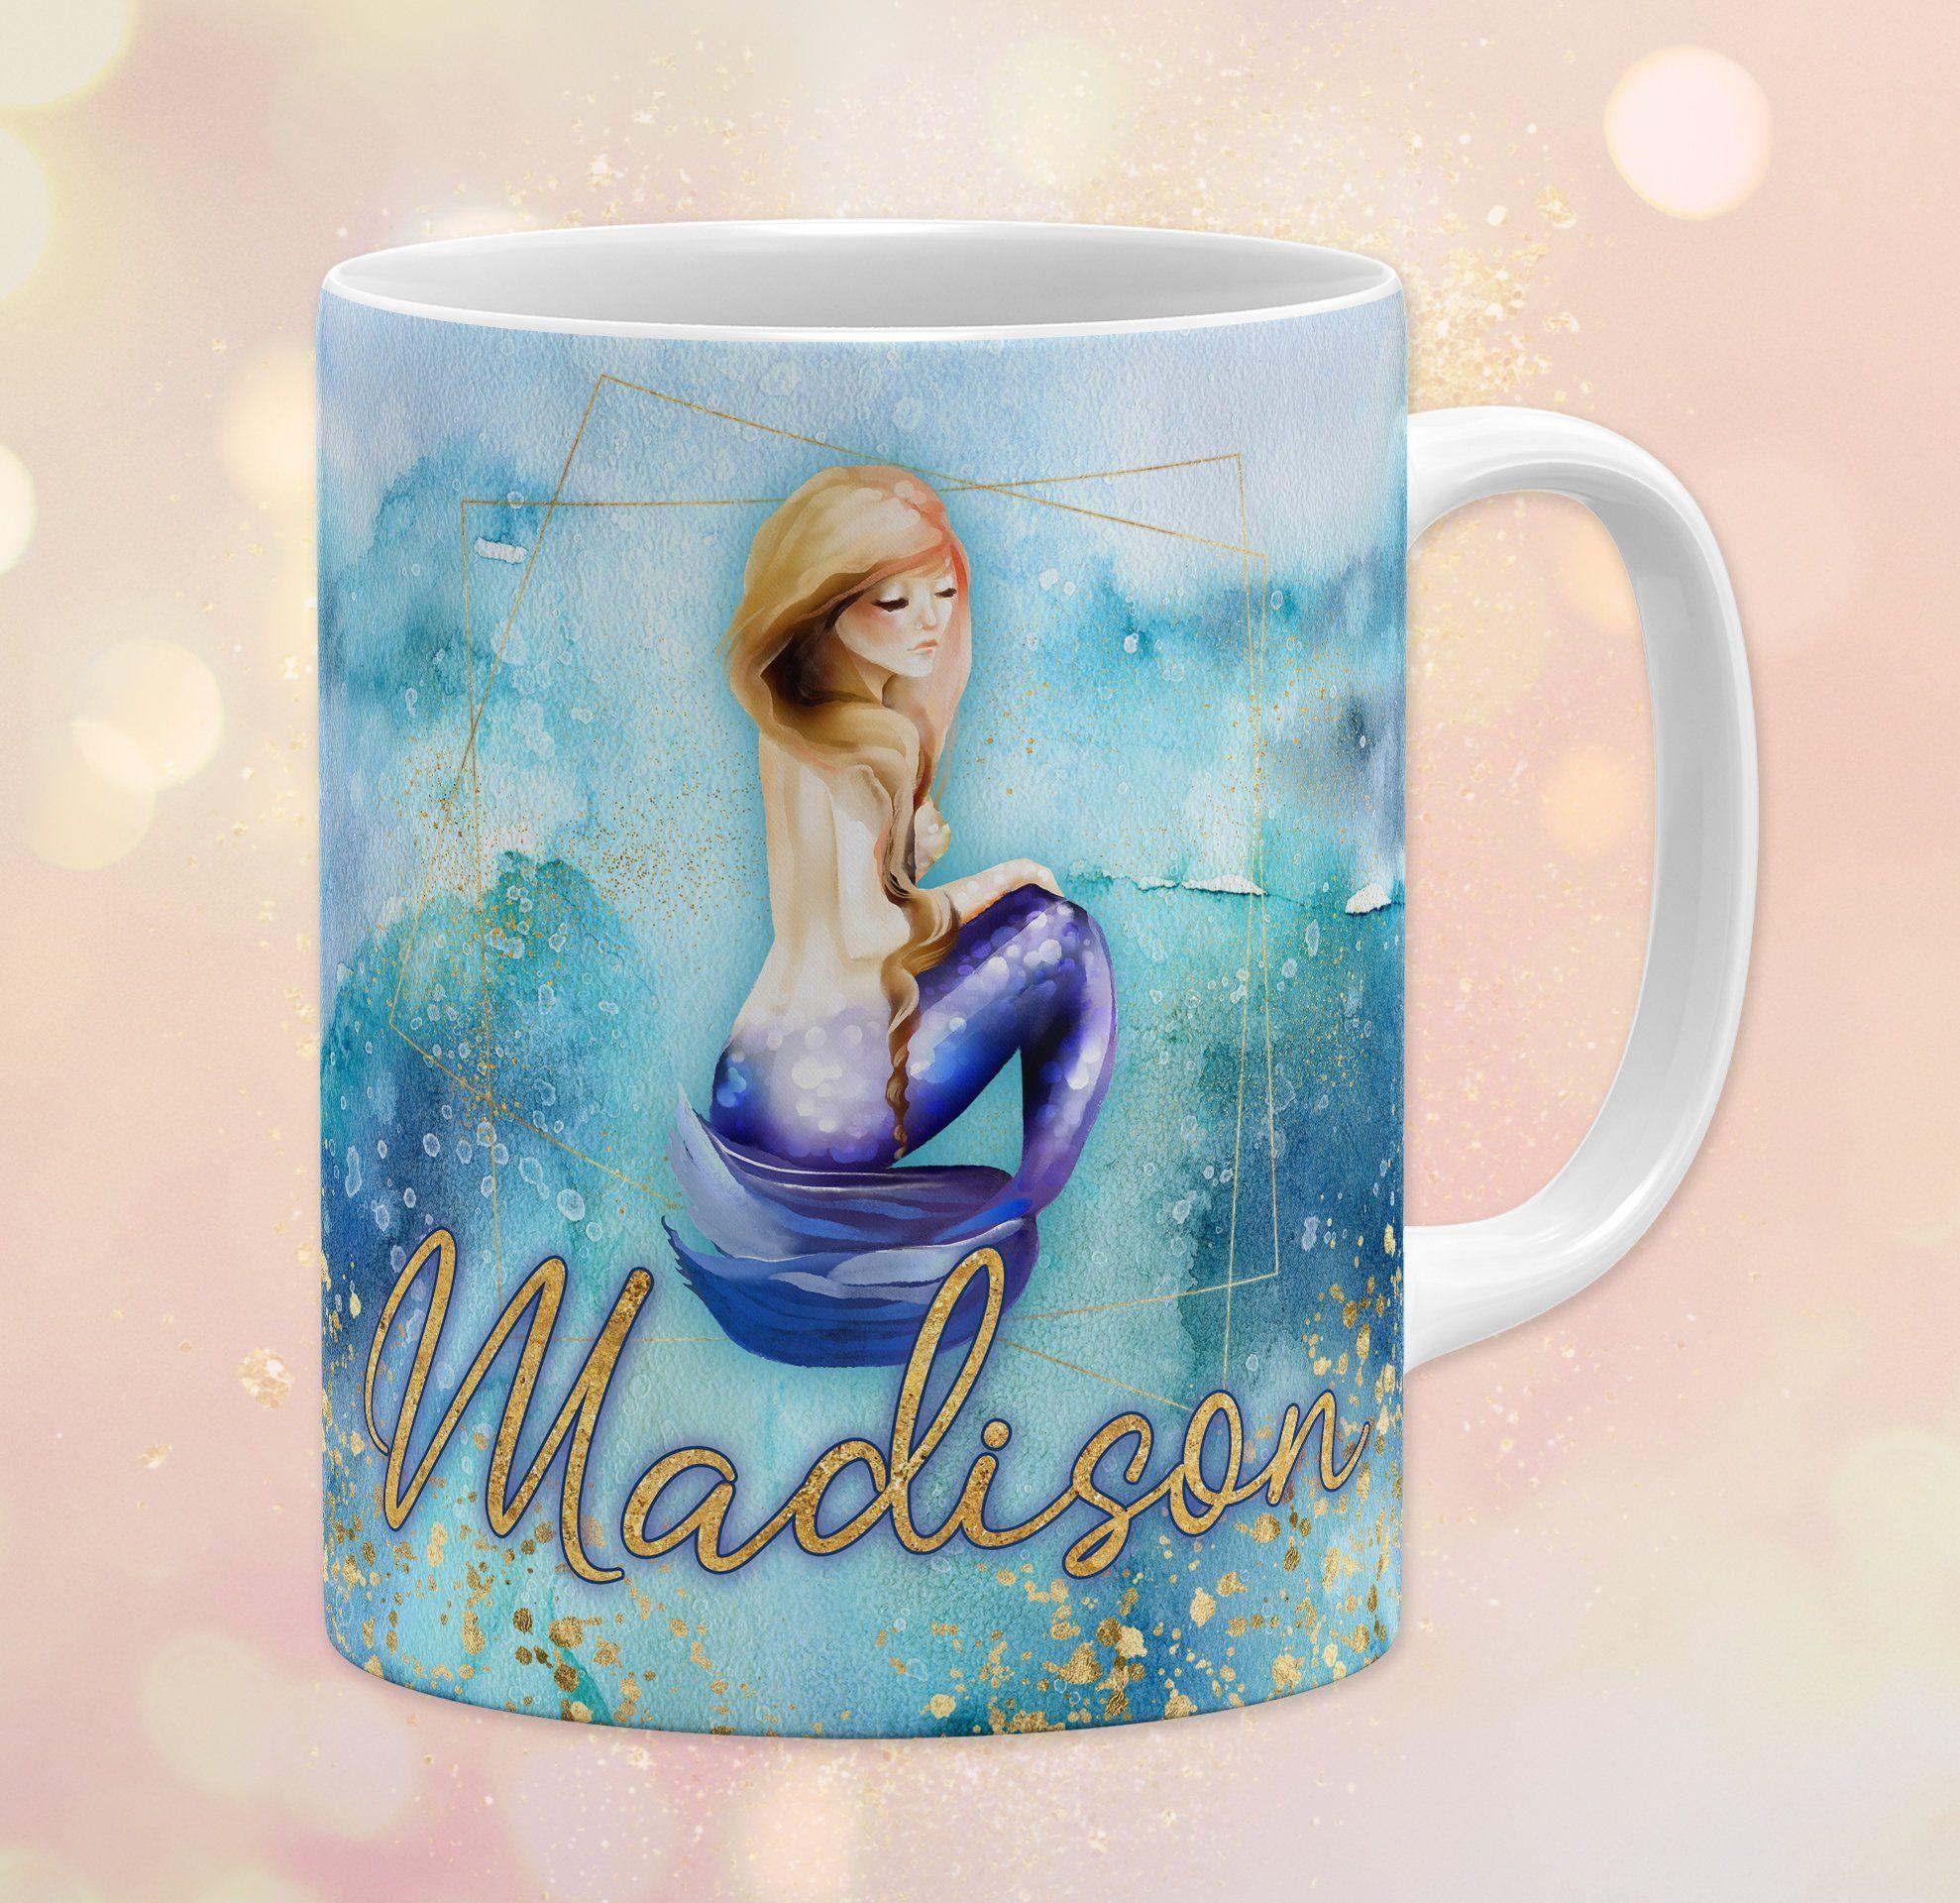 Personalized Mermaid 11 Oz Ceramic Coffee Mug Watercolor Waves